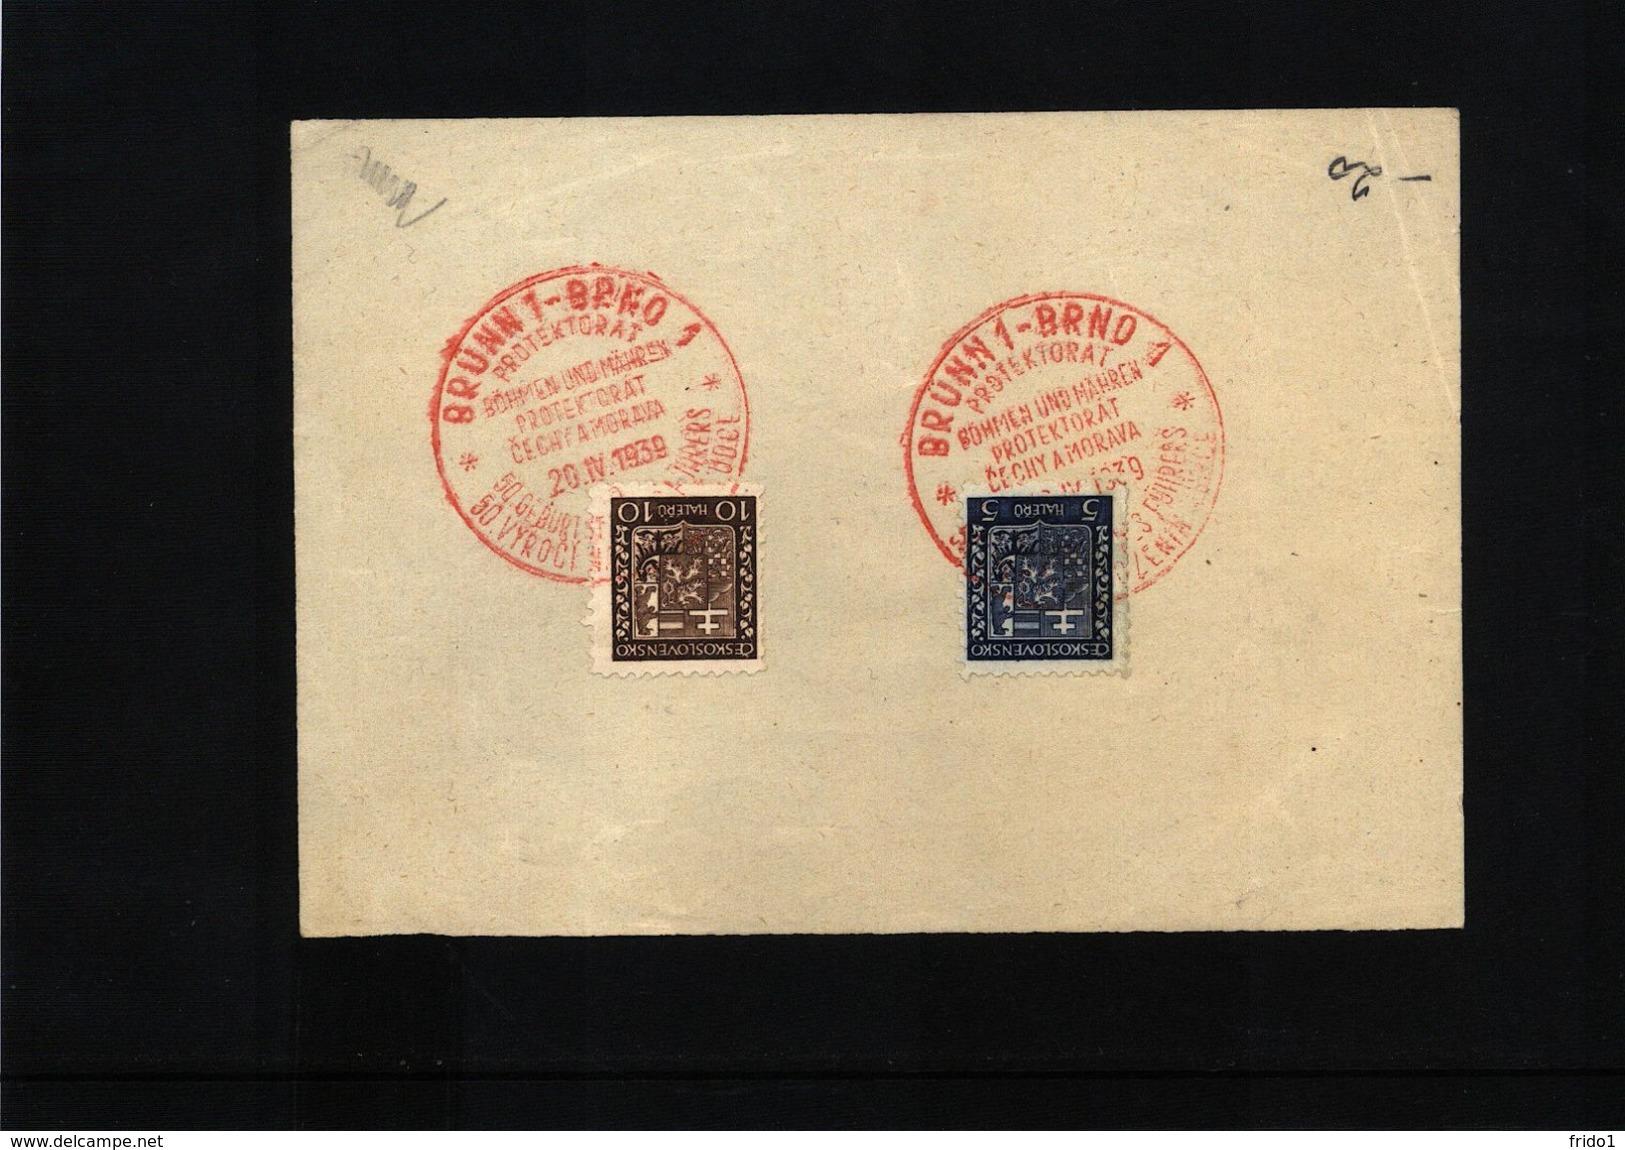 Czechoslovakia 1939 Brno Interesting Postmark - Briefe U. Dokumente